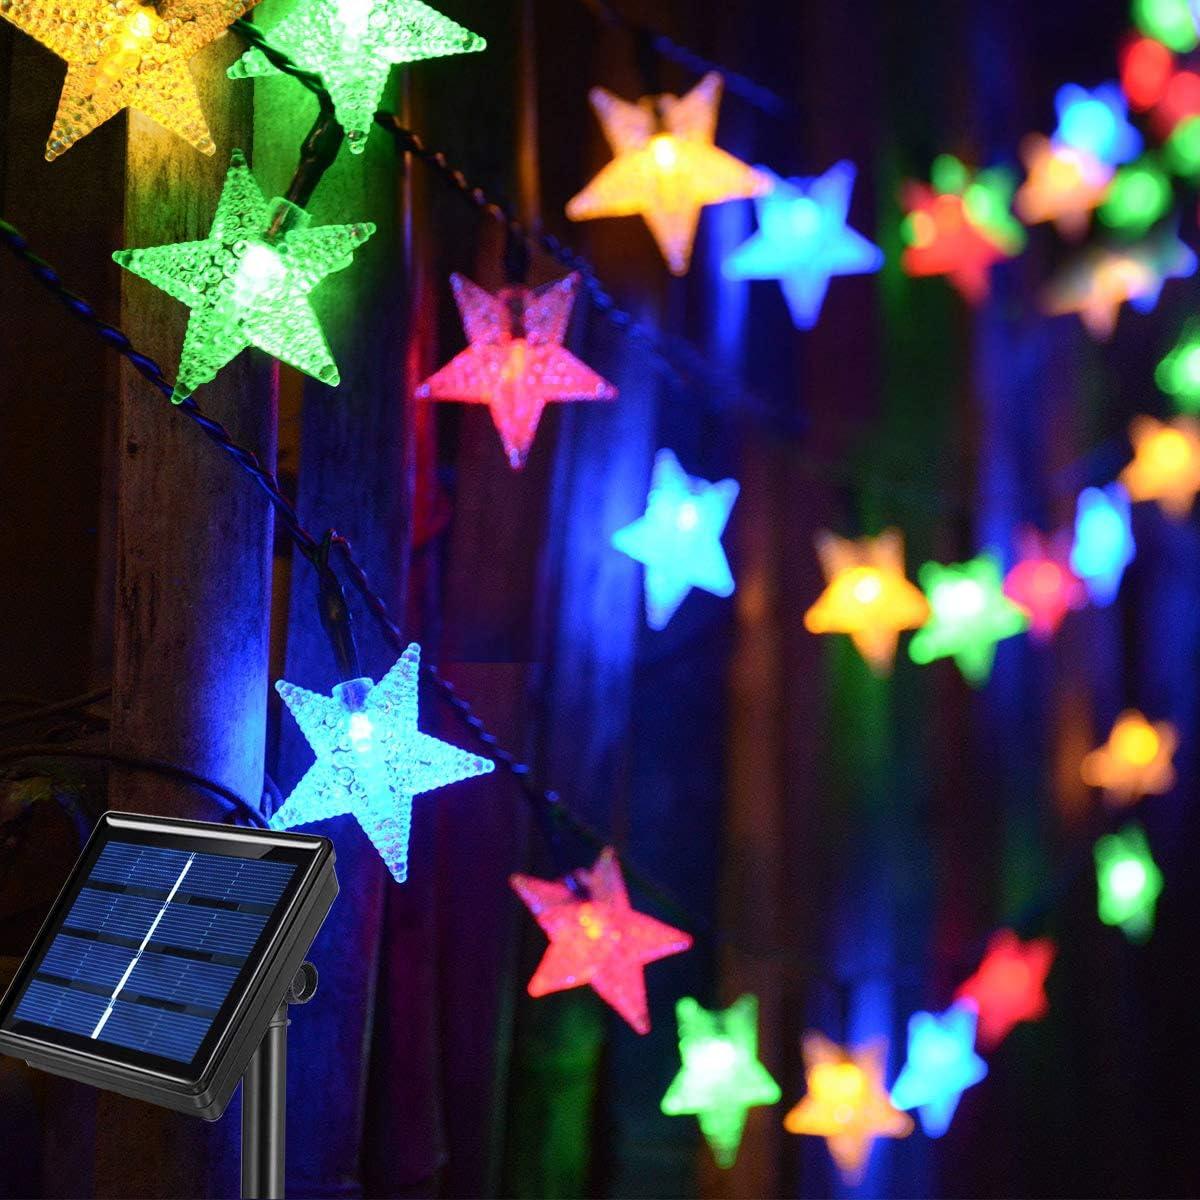 Abkshine 50ft 120LED Solar String Fairy Lights Outdoor,Waterproof Star Twinkle Decorative Lights for Garden,Patio Post,Deck,Canopy,Gazebo,Porch,Pergola,Balcony,Backyard Fence,Party Decor,Multicolored